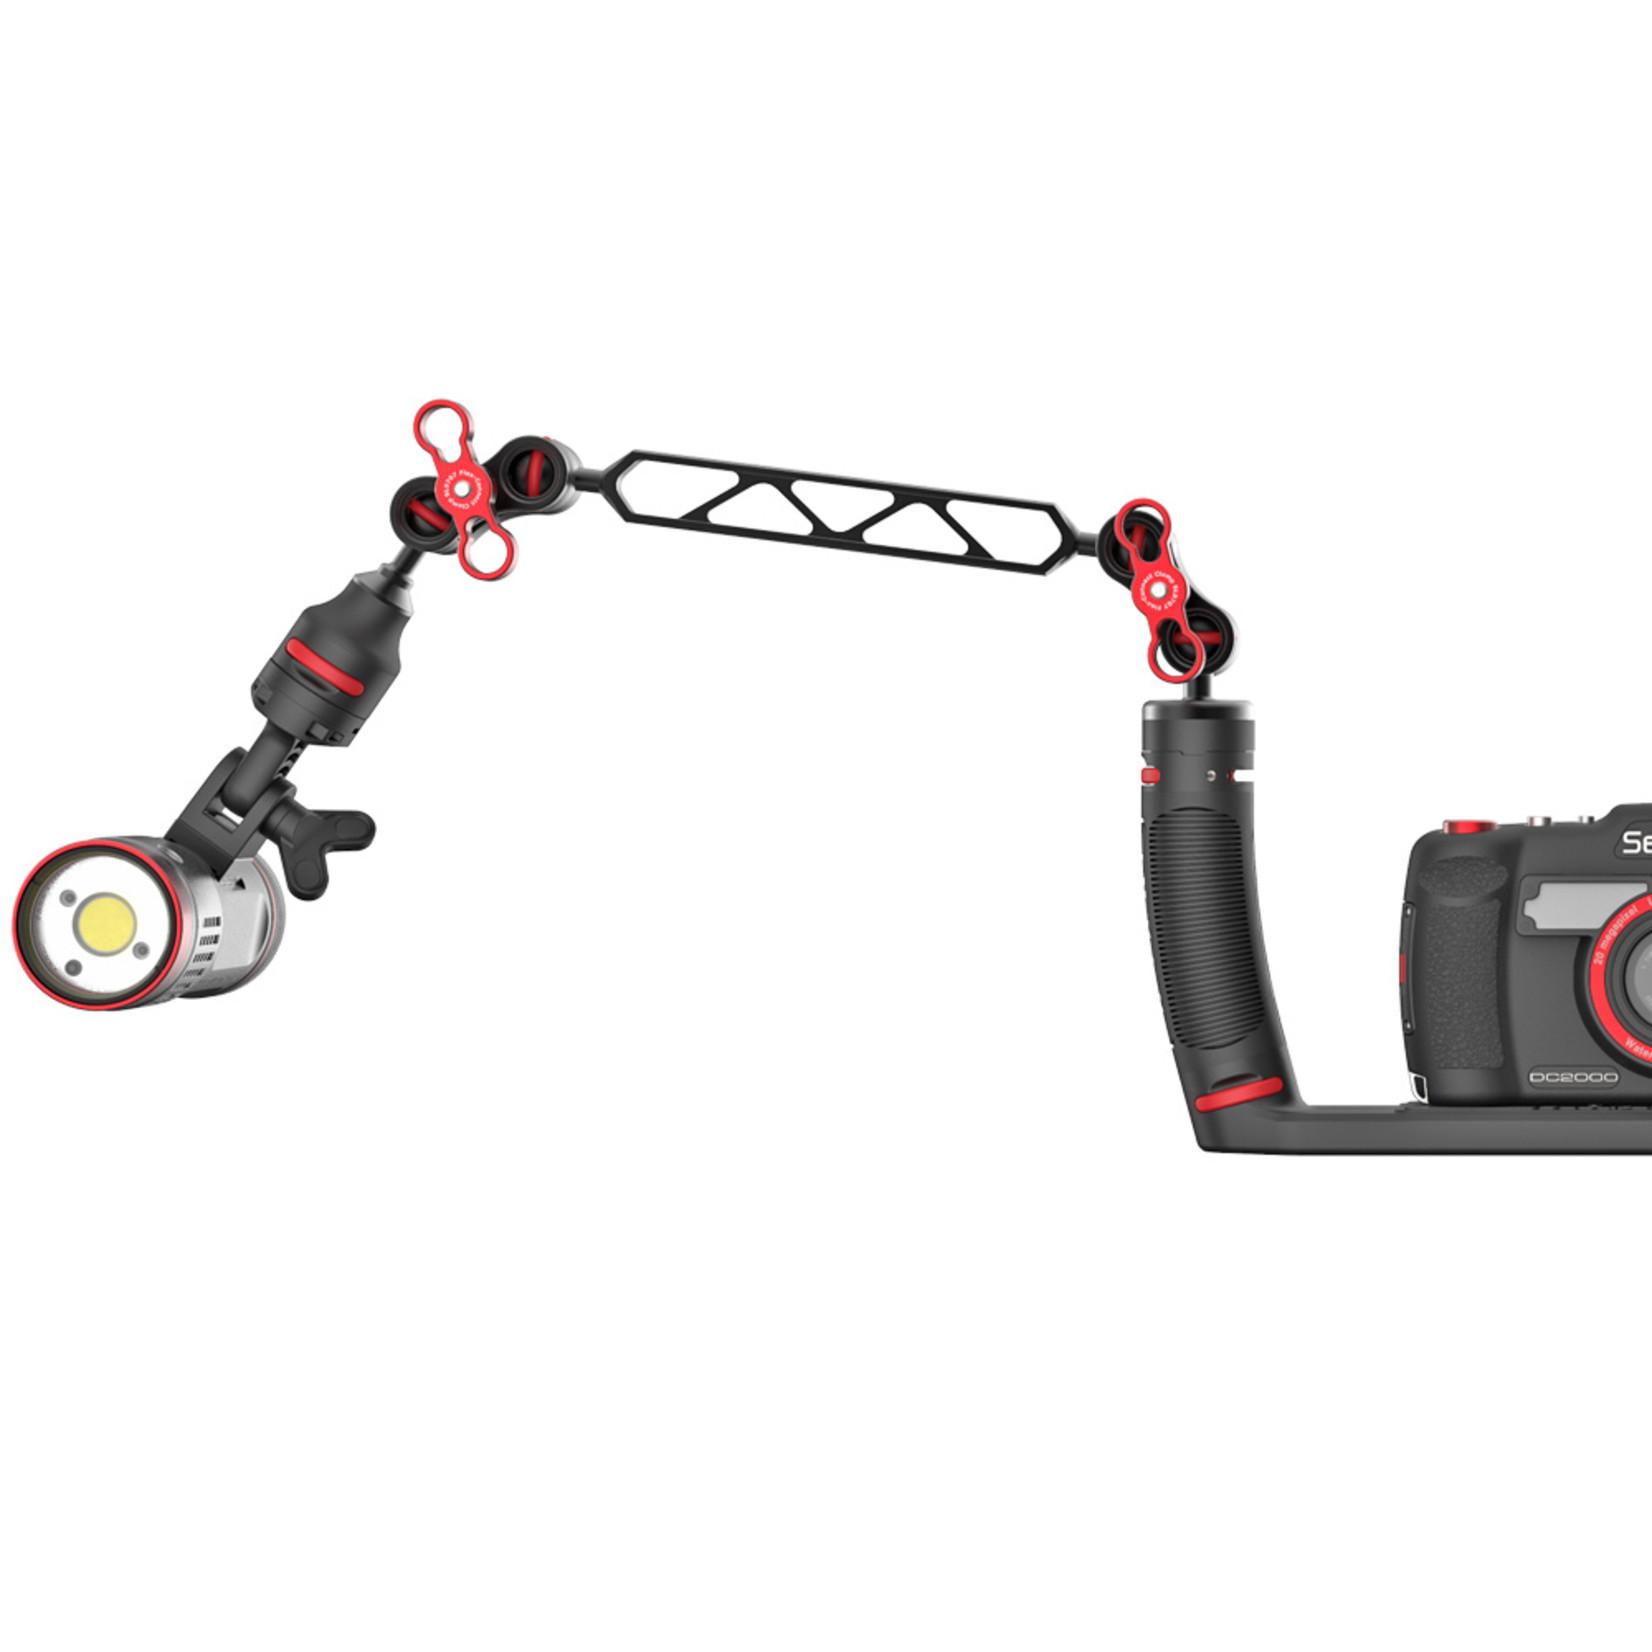 "Sealife Flex - Connect 20cm Rigid Ball Arm for 1"" ball system"